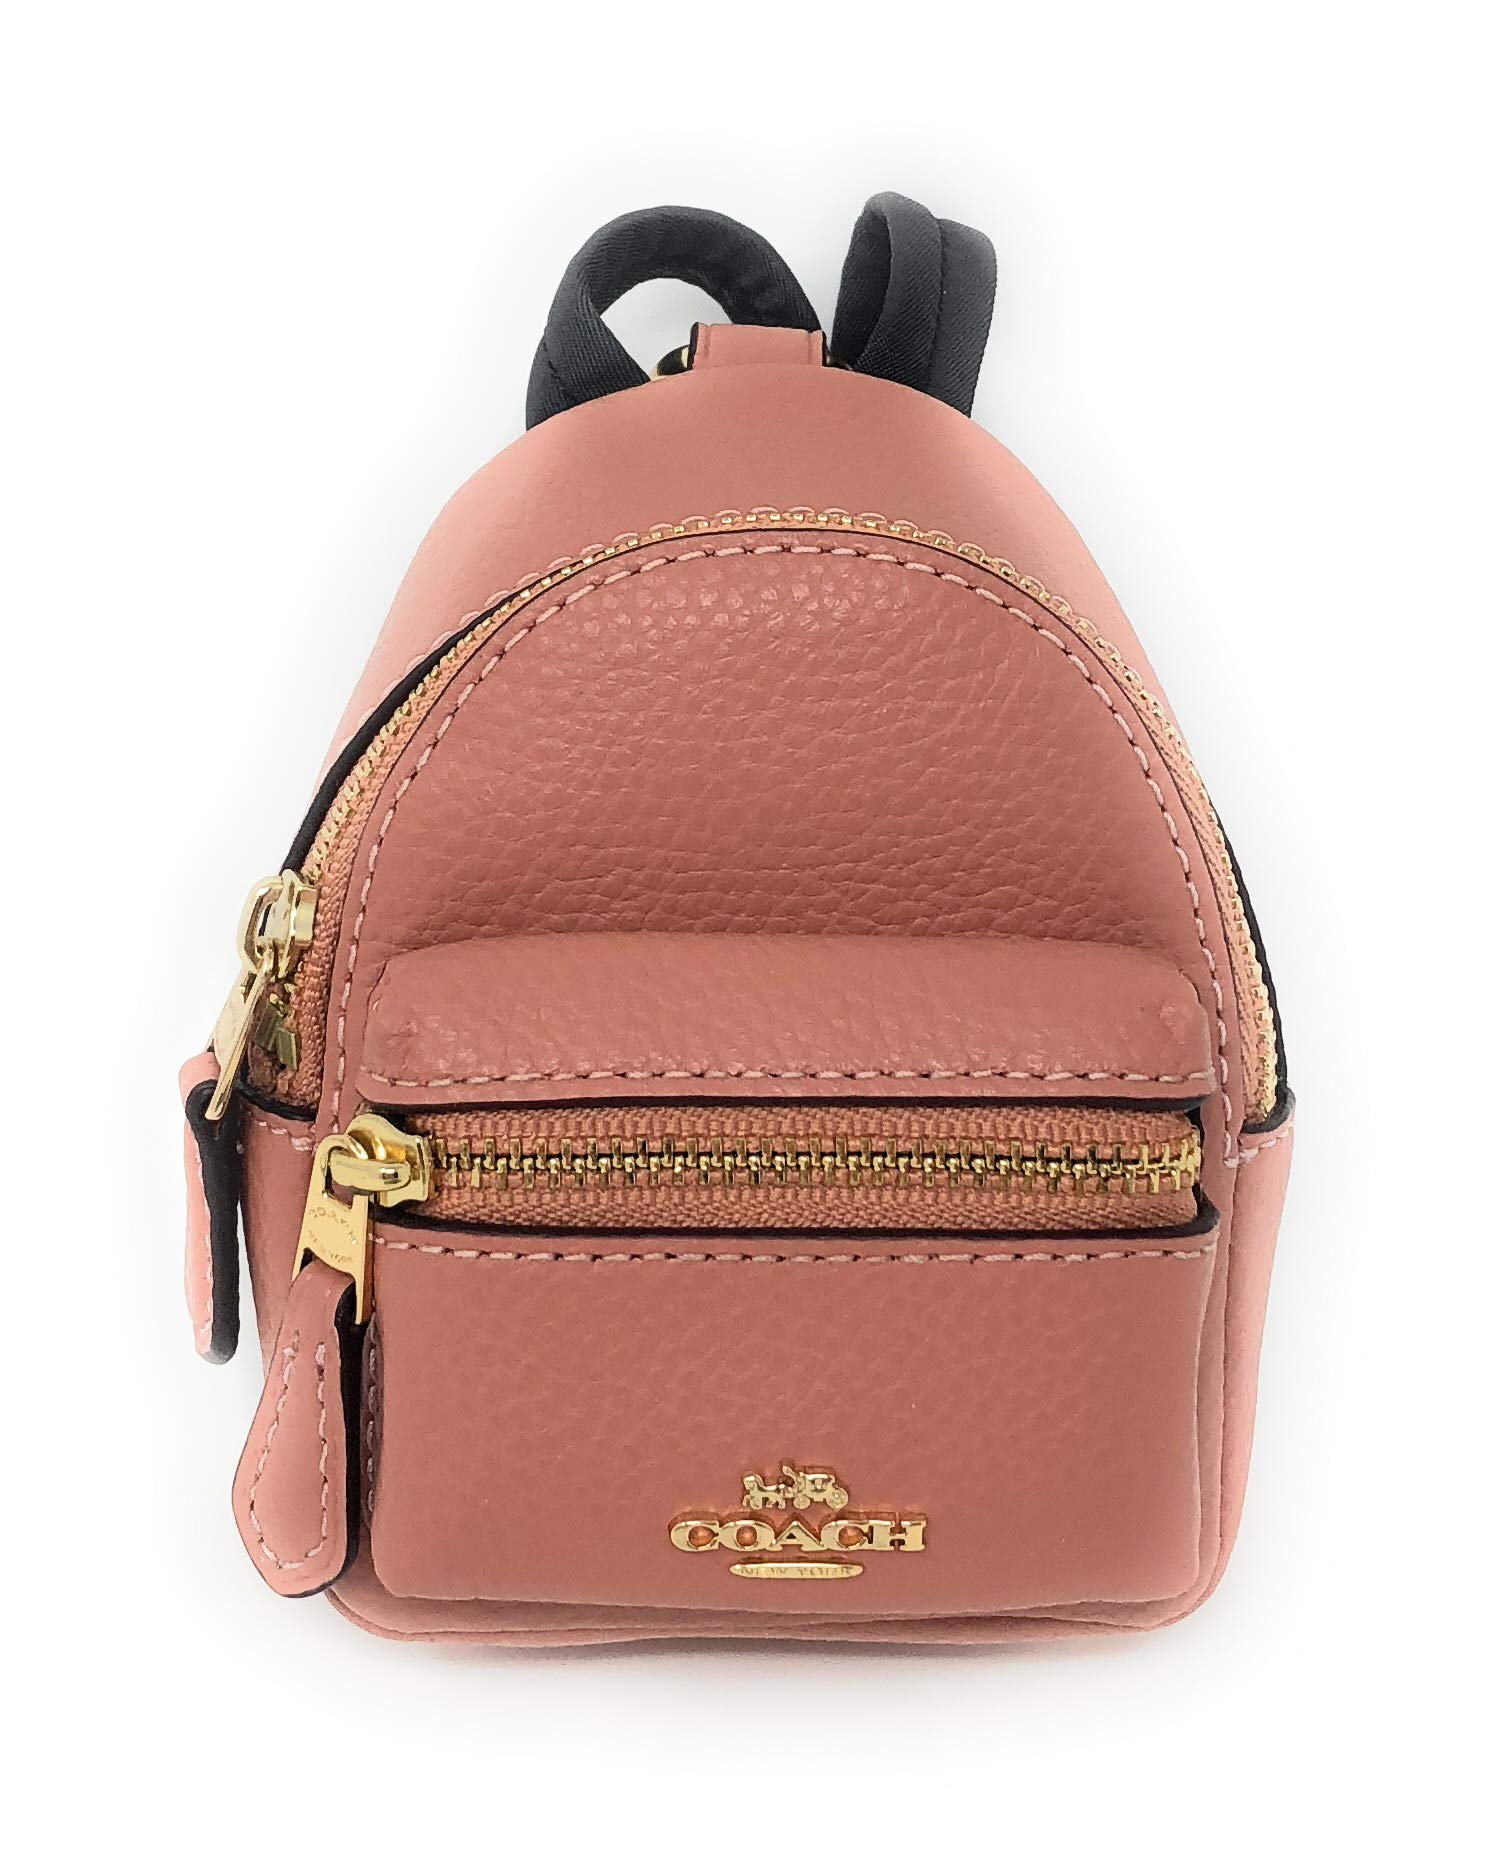 Coach Leather Backpack Coin Purse Bag Charm Key-chain